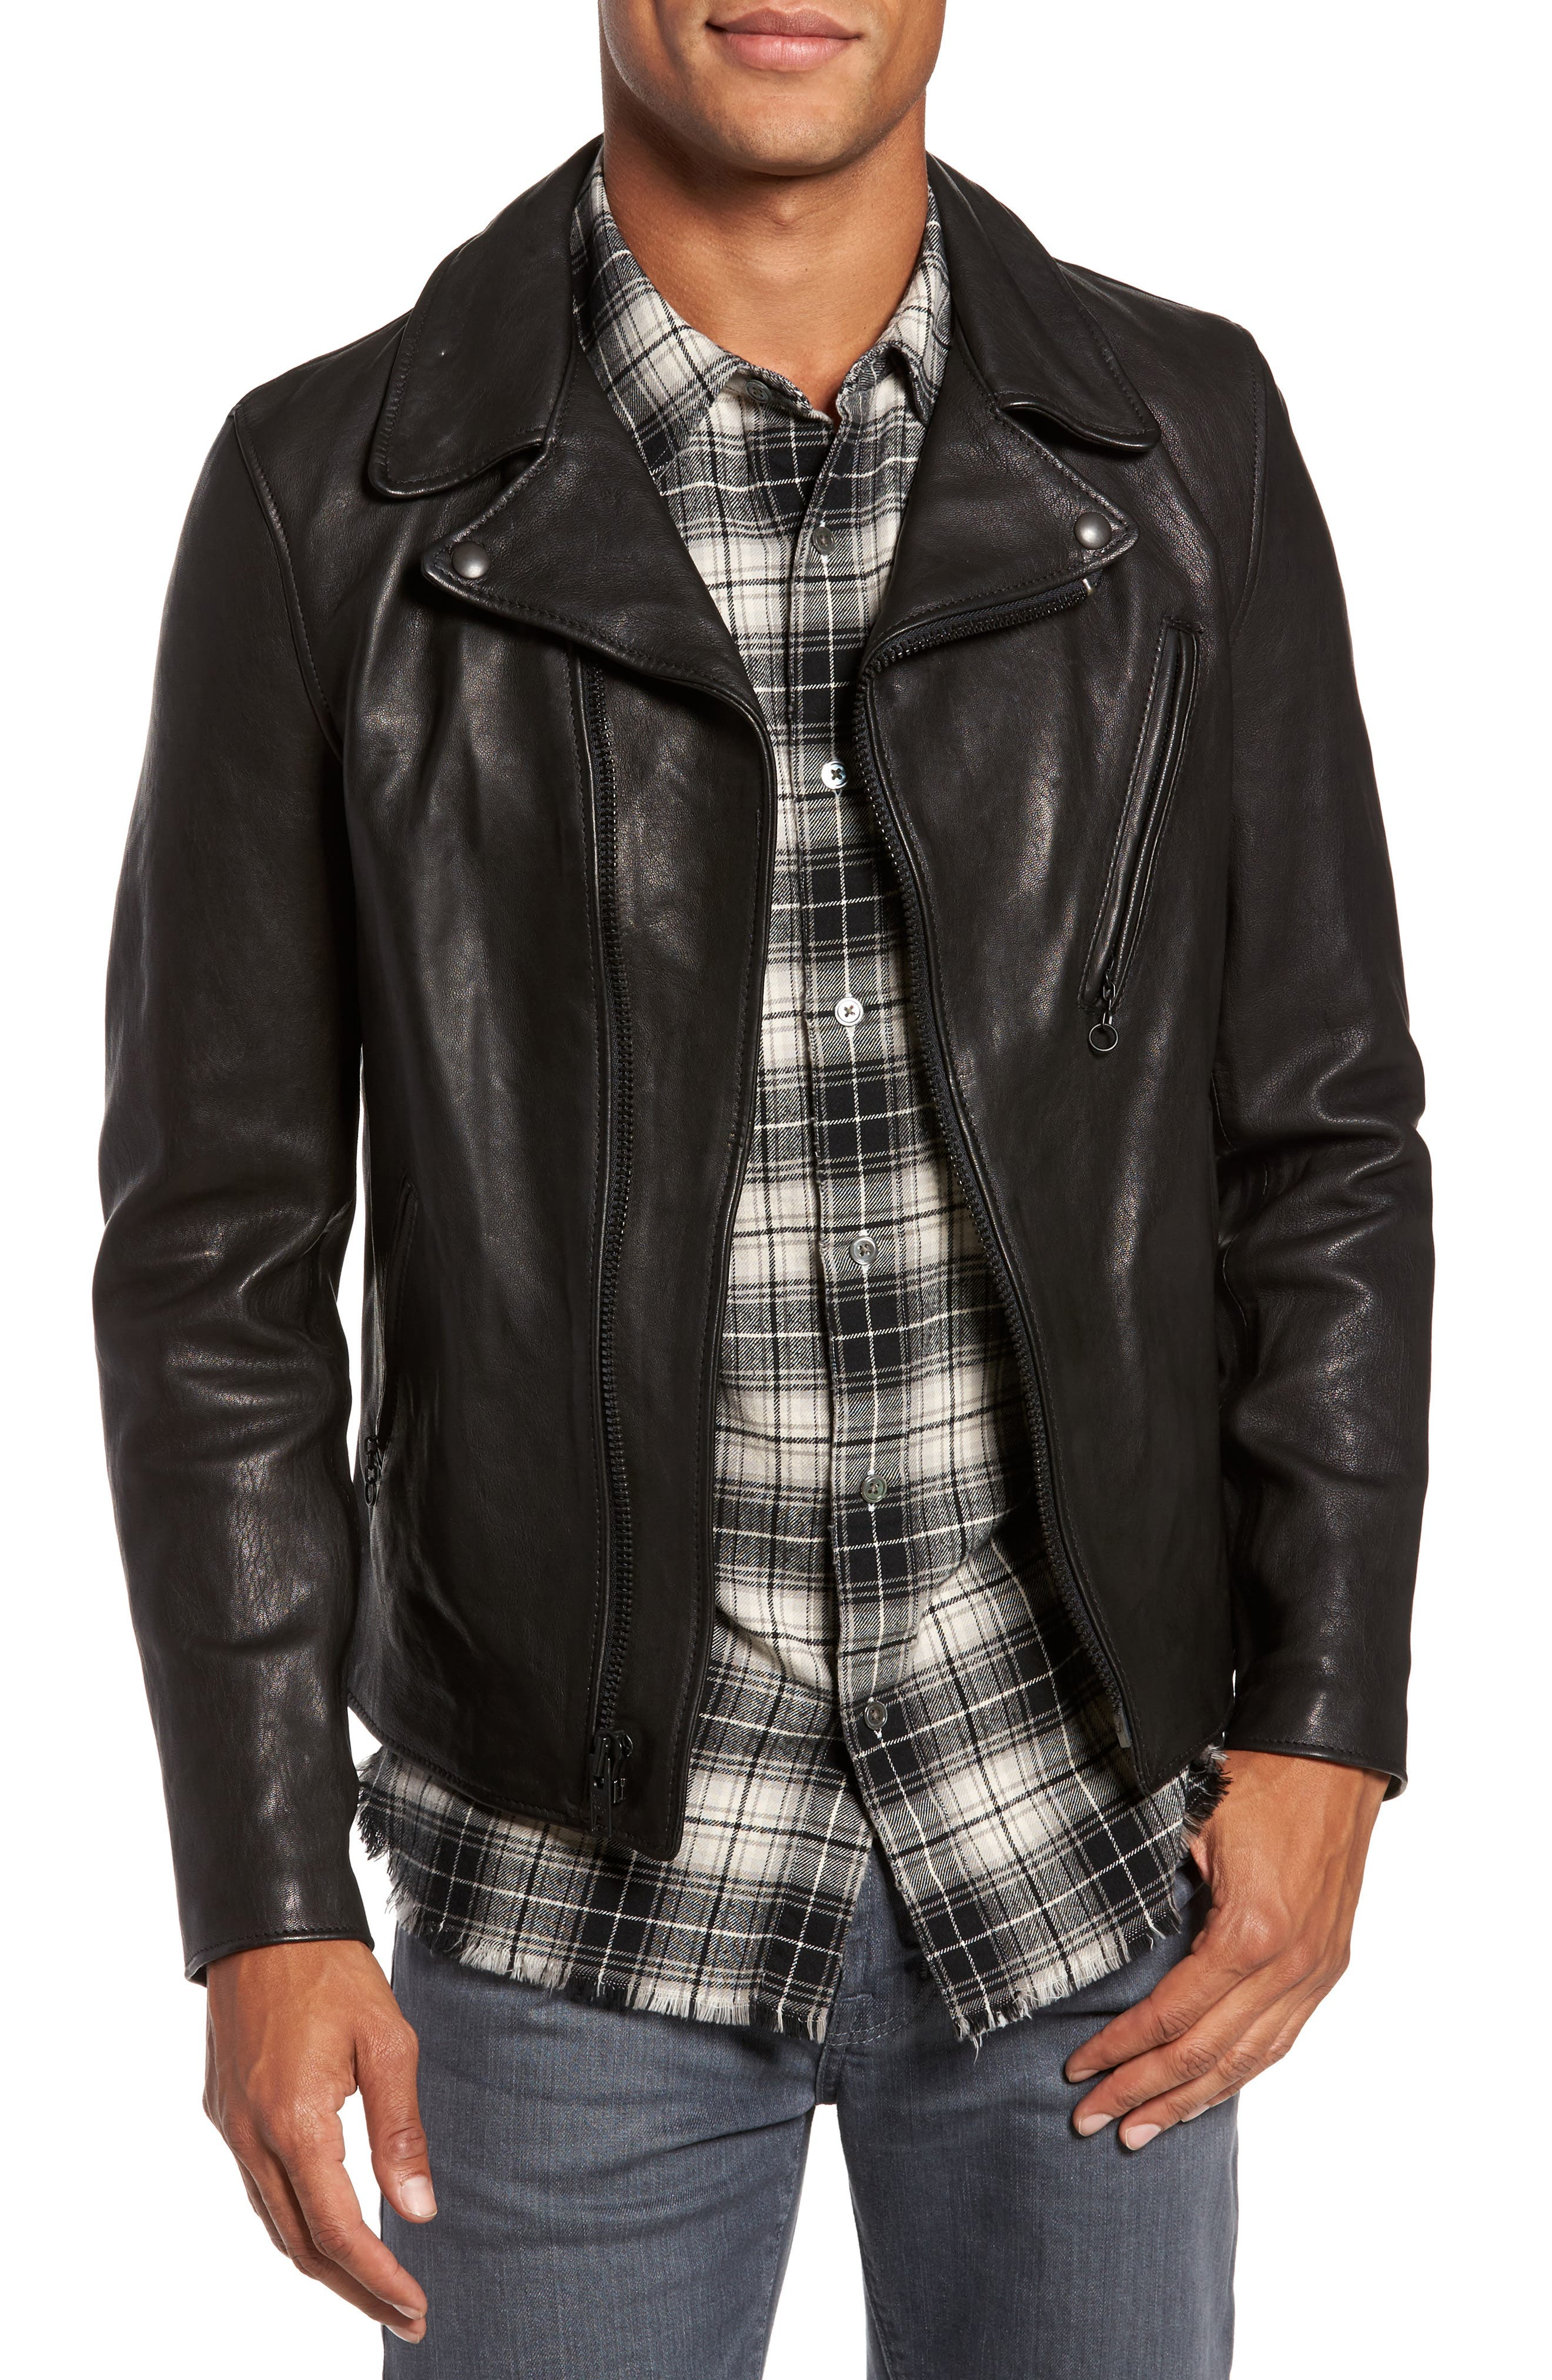 Schott NYC Perfecto Brand Leather Jacket